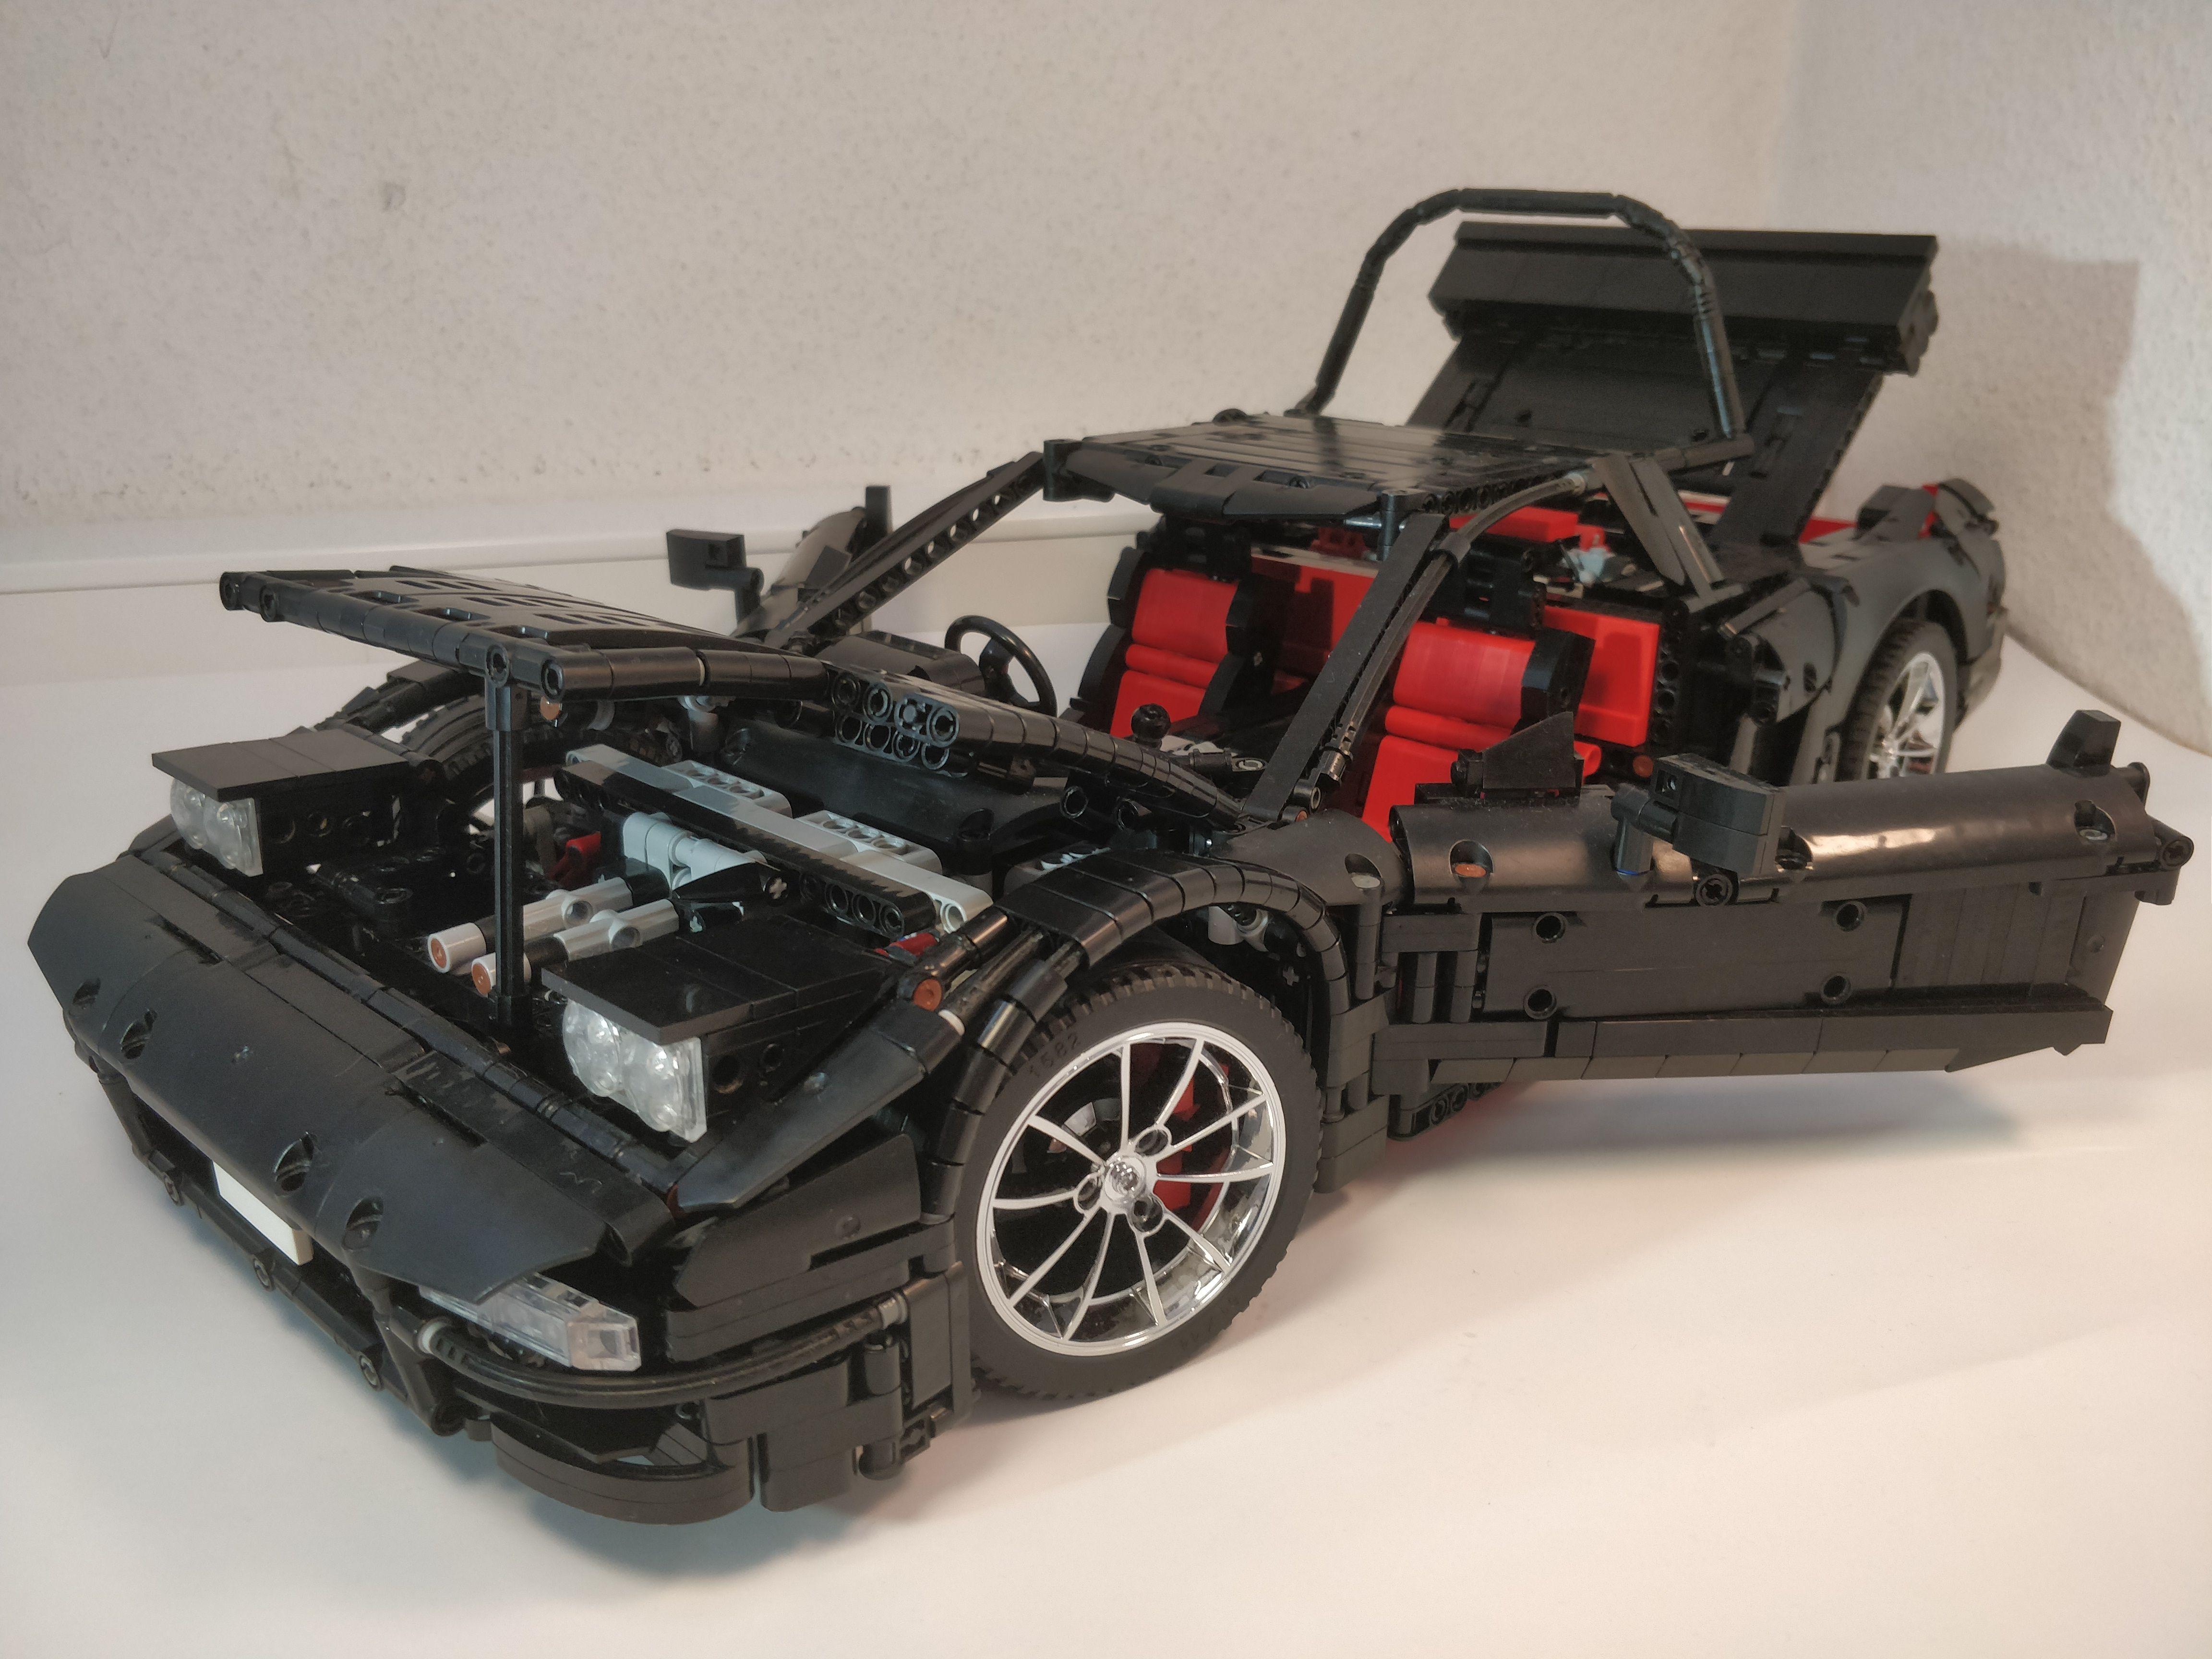 Pin von Xandros Aninhal auf Lego Technic SportCars & Cars